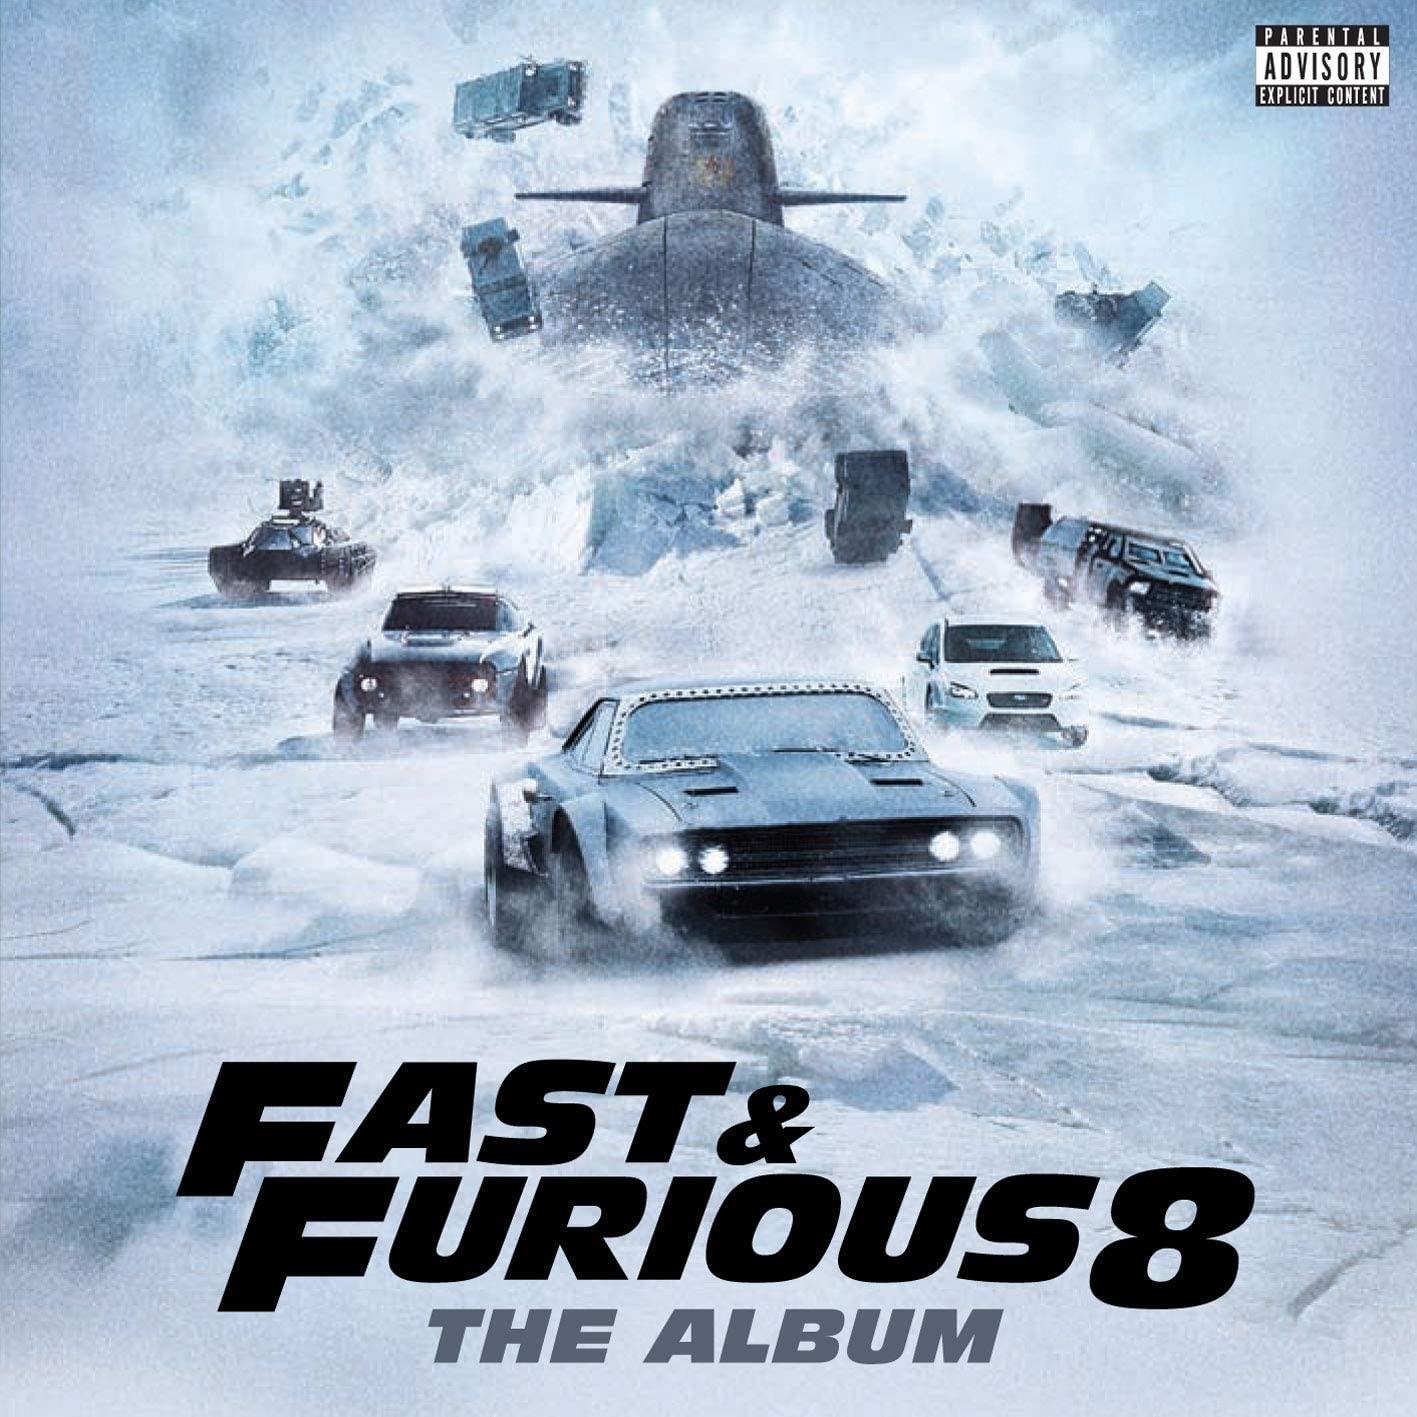 Soundtrack - CD Fast & Furious 8: The Album